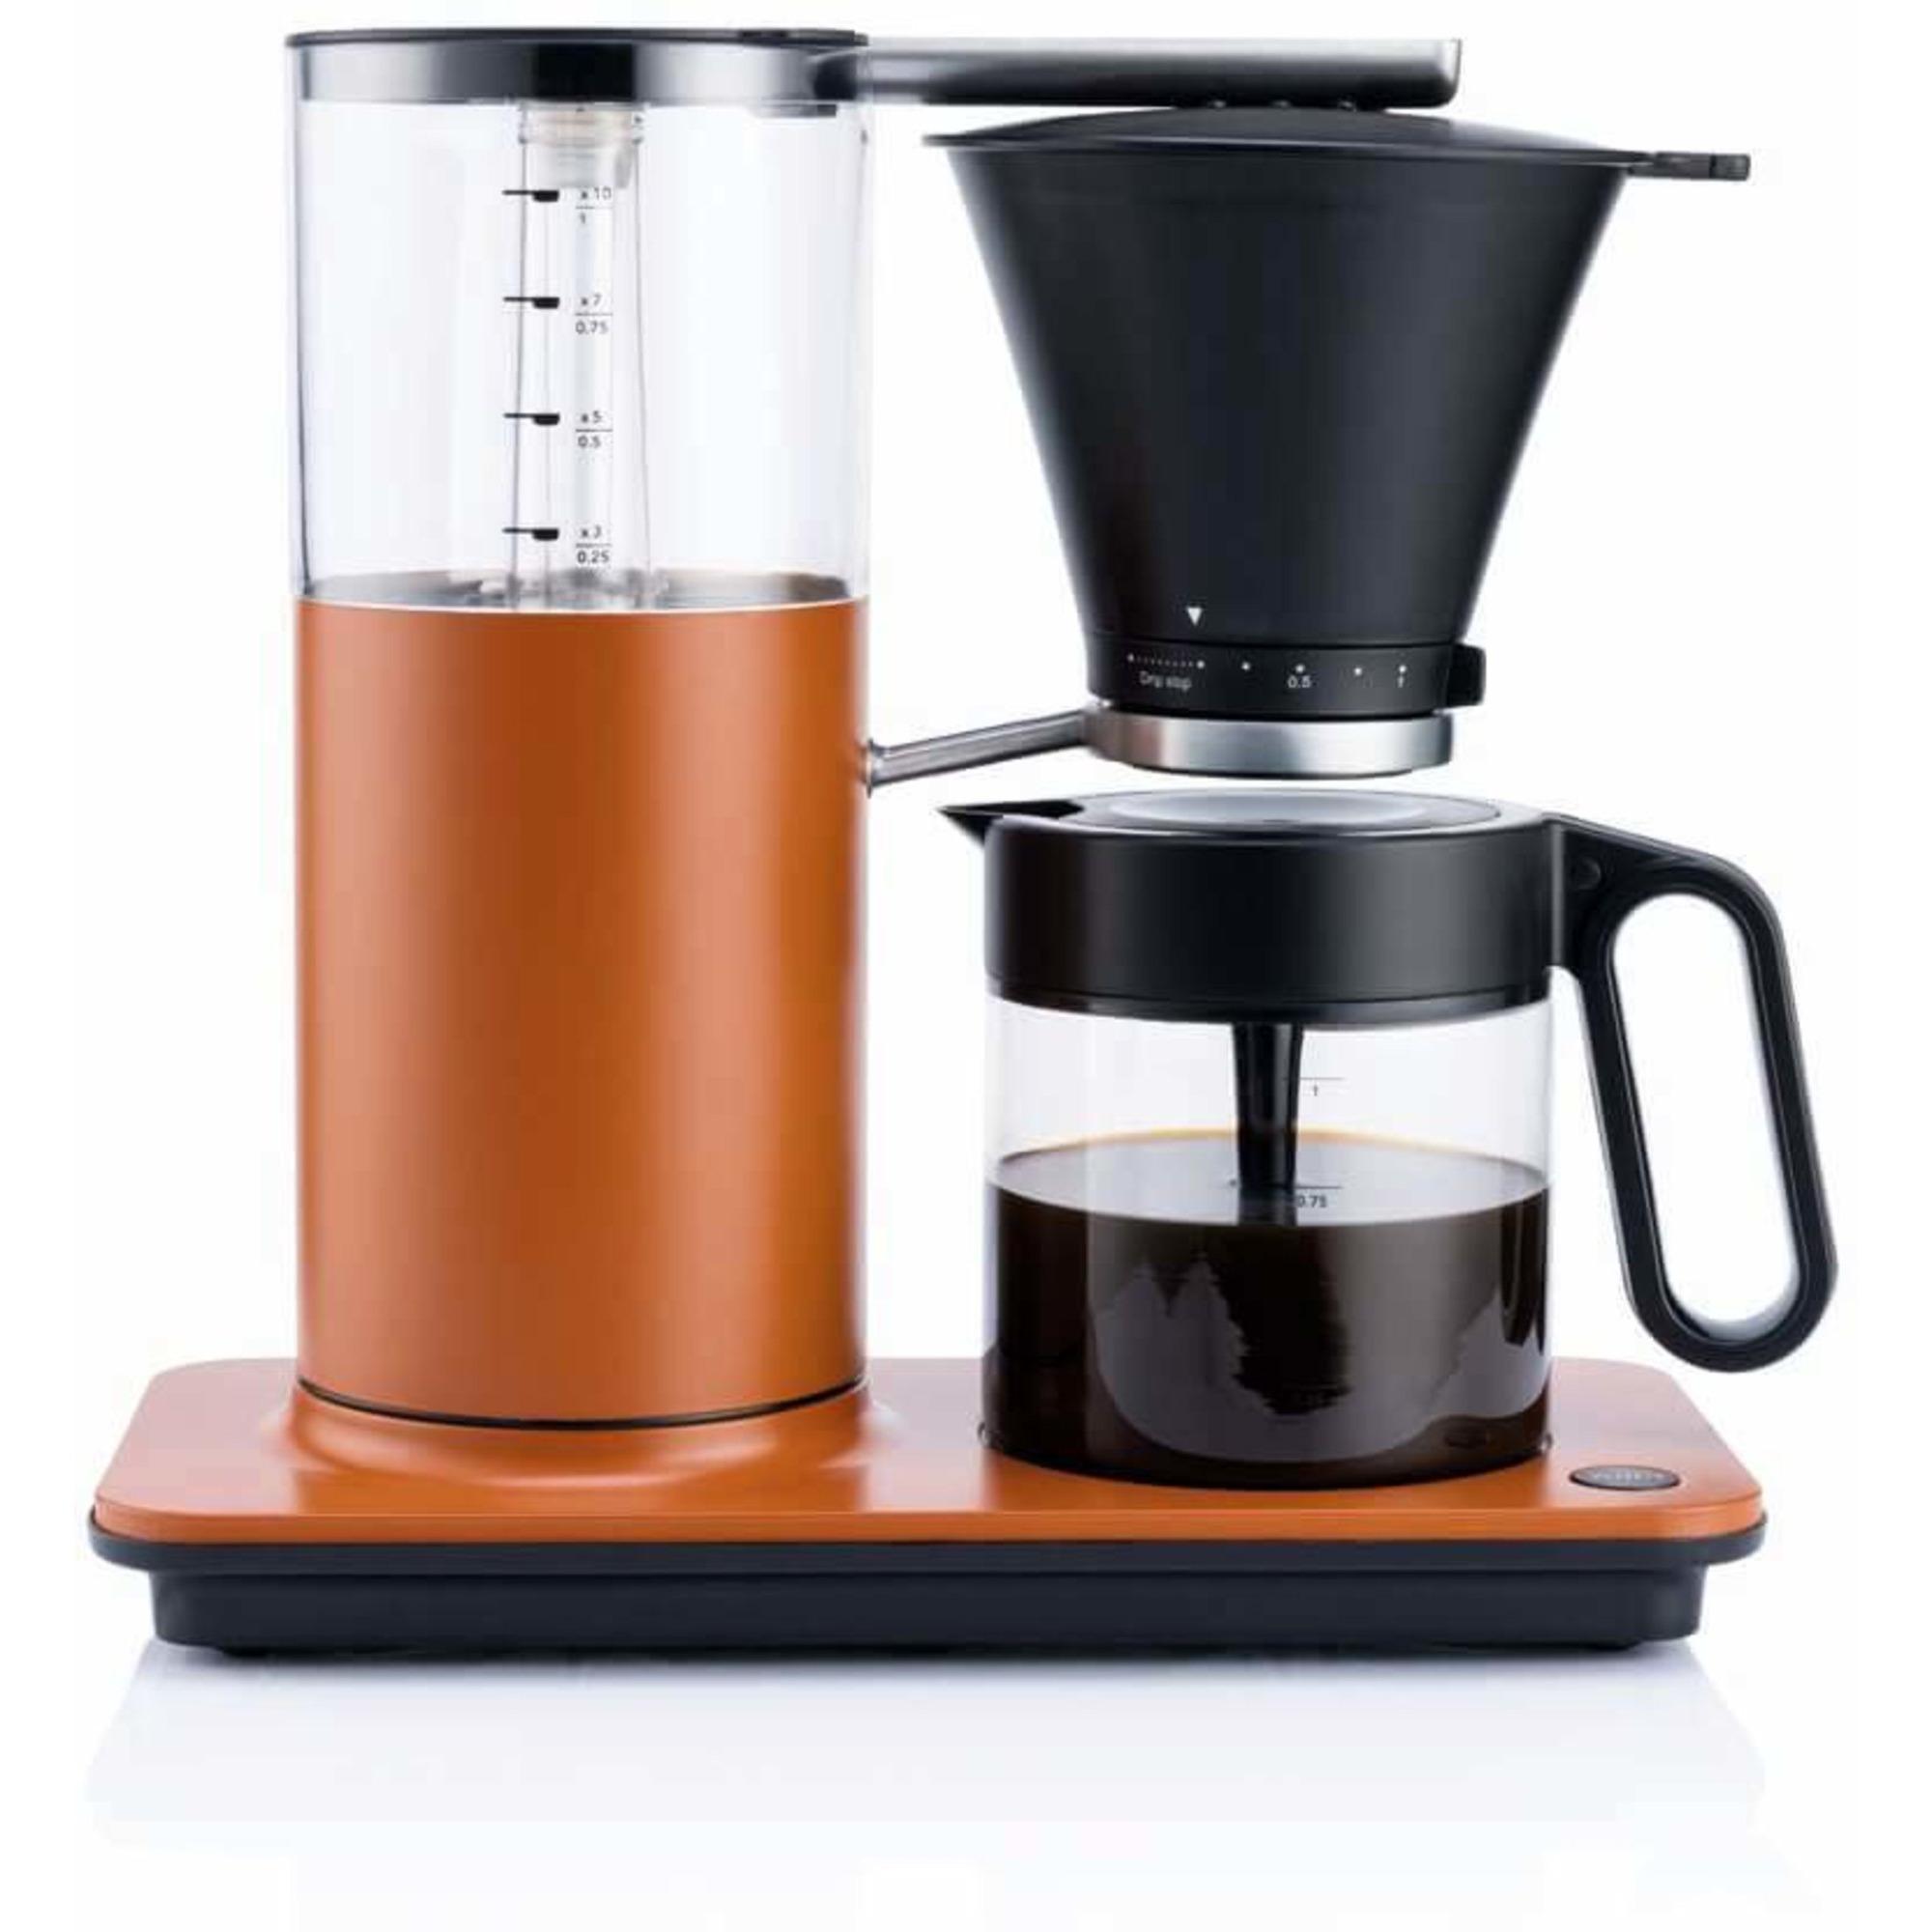 Wilfa Kaffebryggare Terracotta Röd CMC-100TC